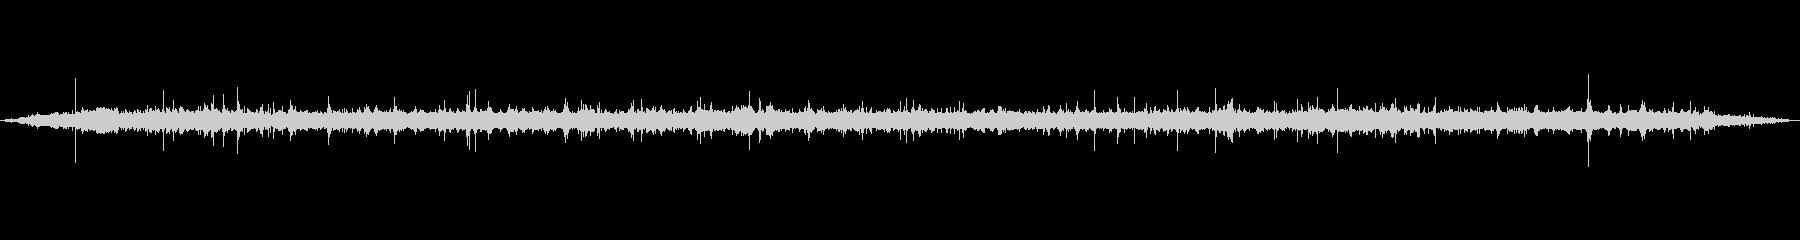 [ASMR]波打ち際の音_011の未再生の波形